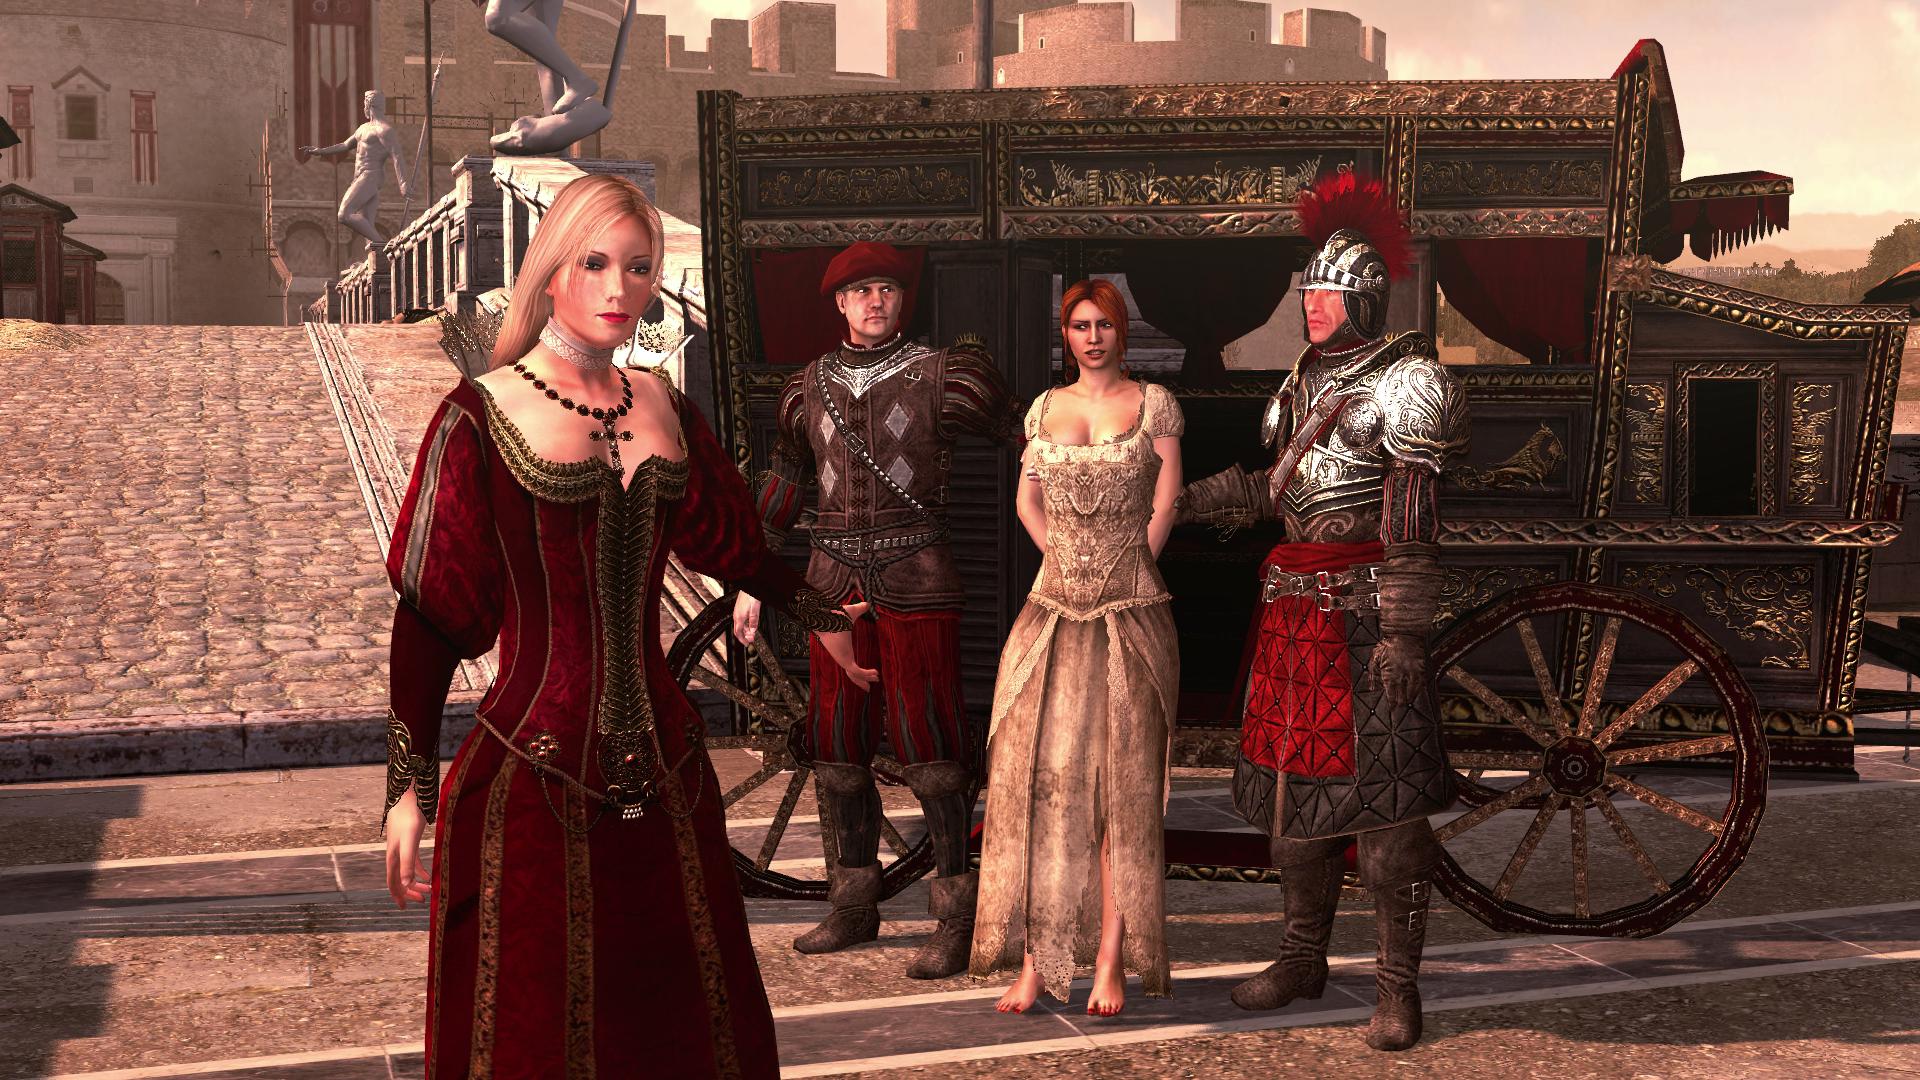 Caterina Sforza: biography 60